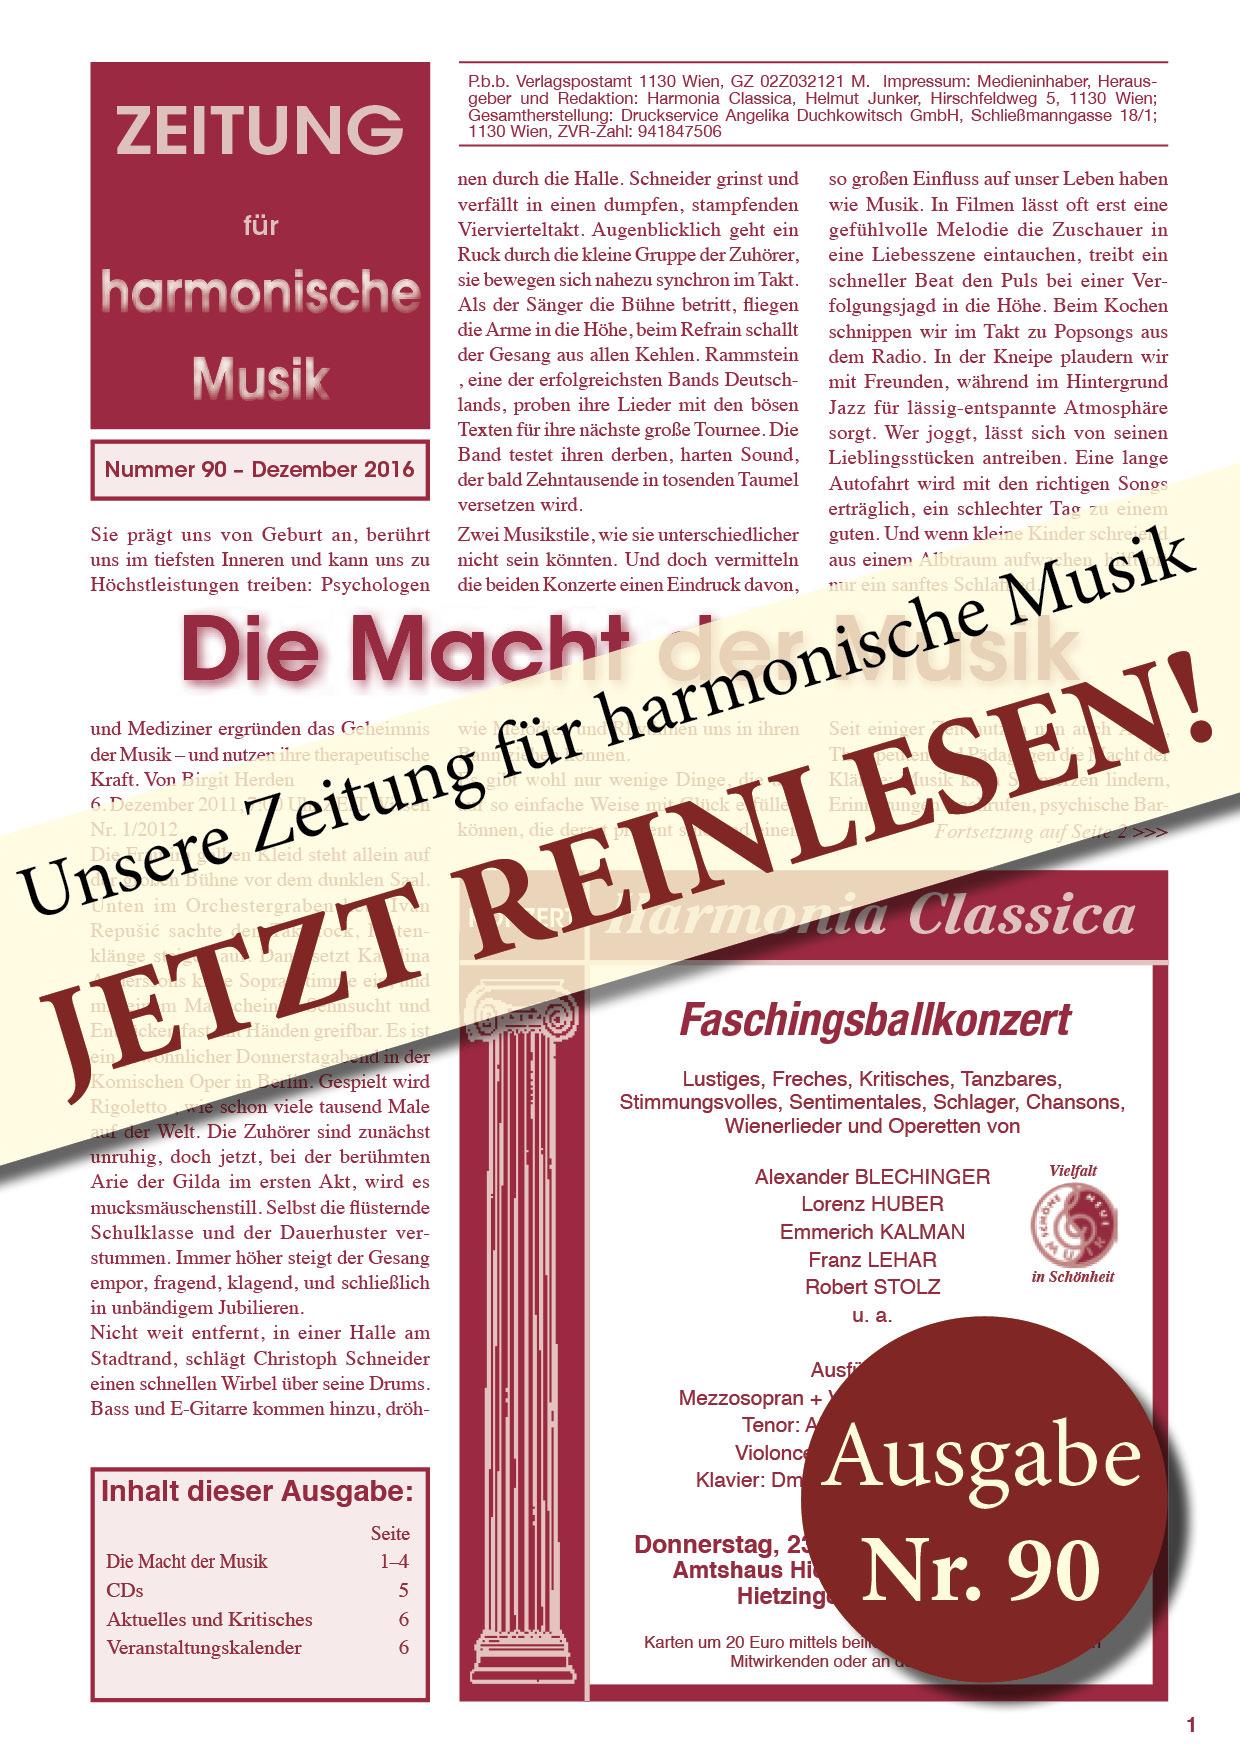 Harmonia-Classica-78-AK-1 Kopie